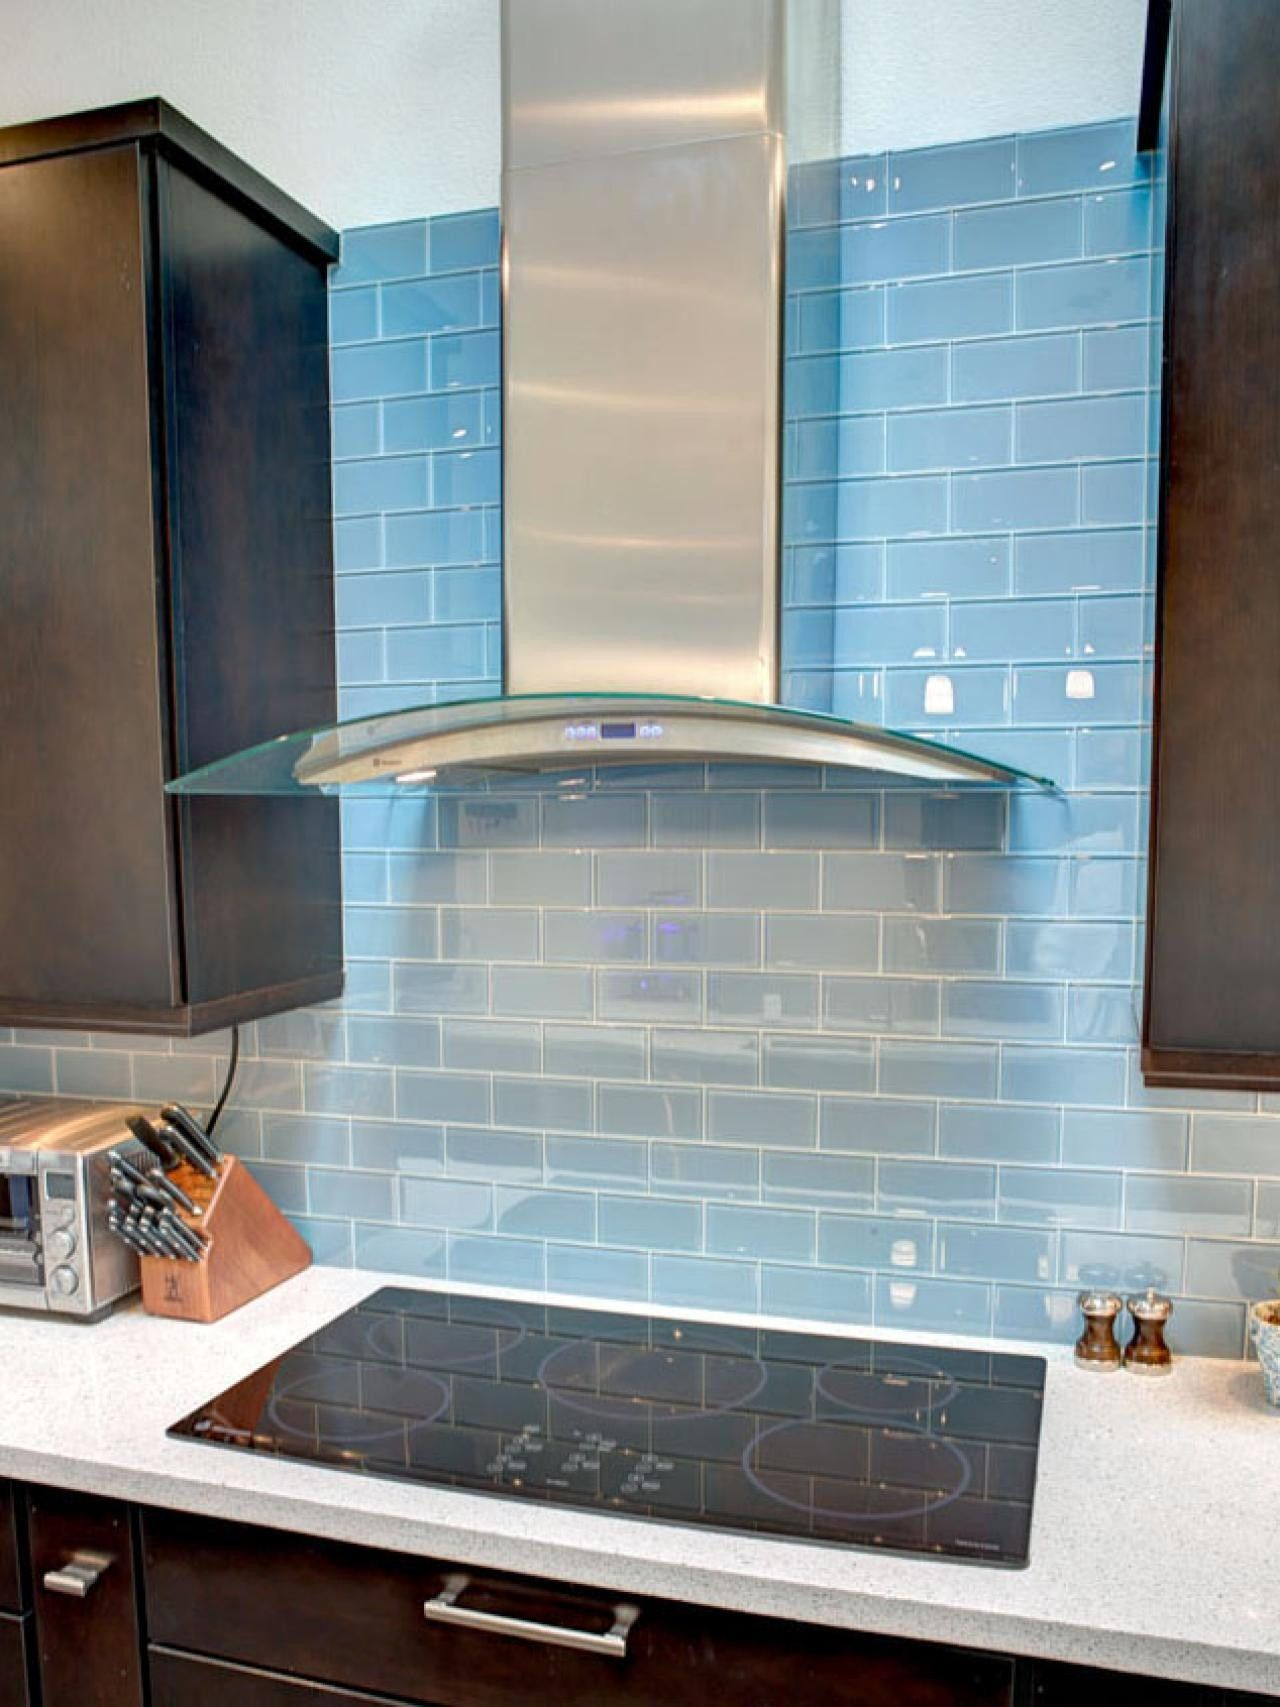 Tile Backsplash Behind Range Hood Kitchen Idea Trendy Kitchen